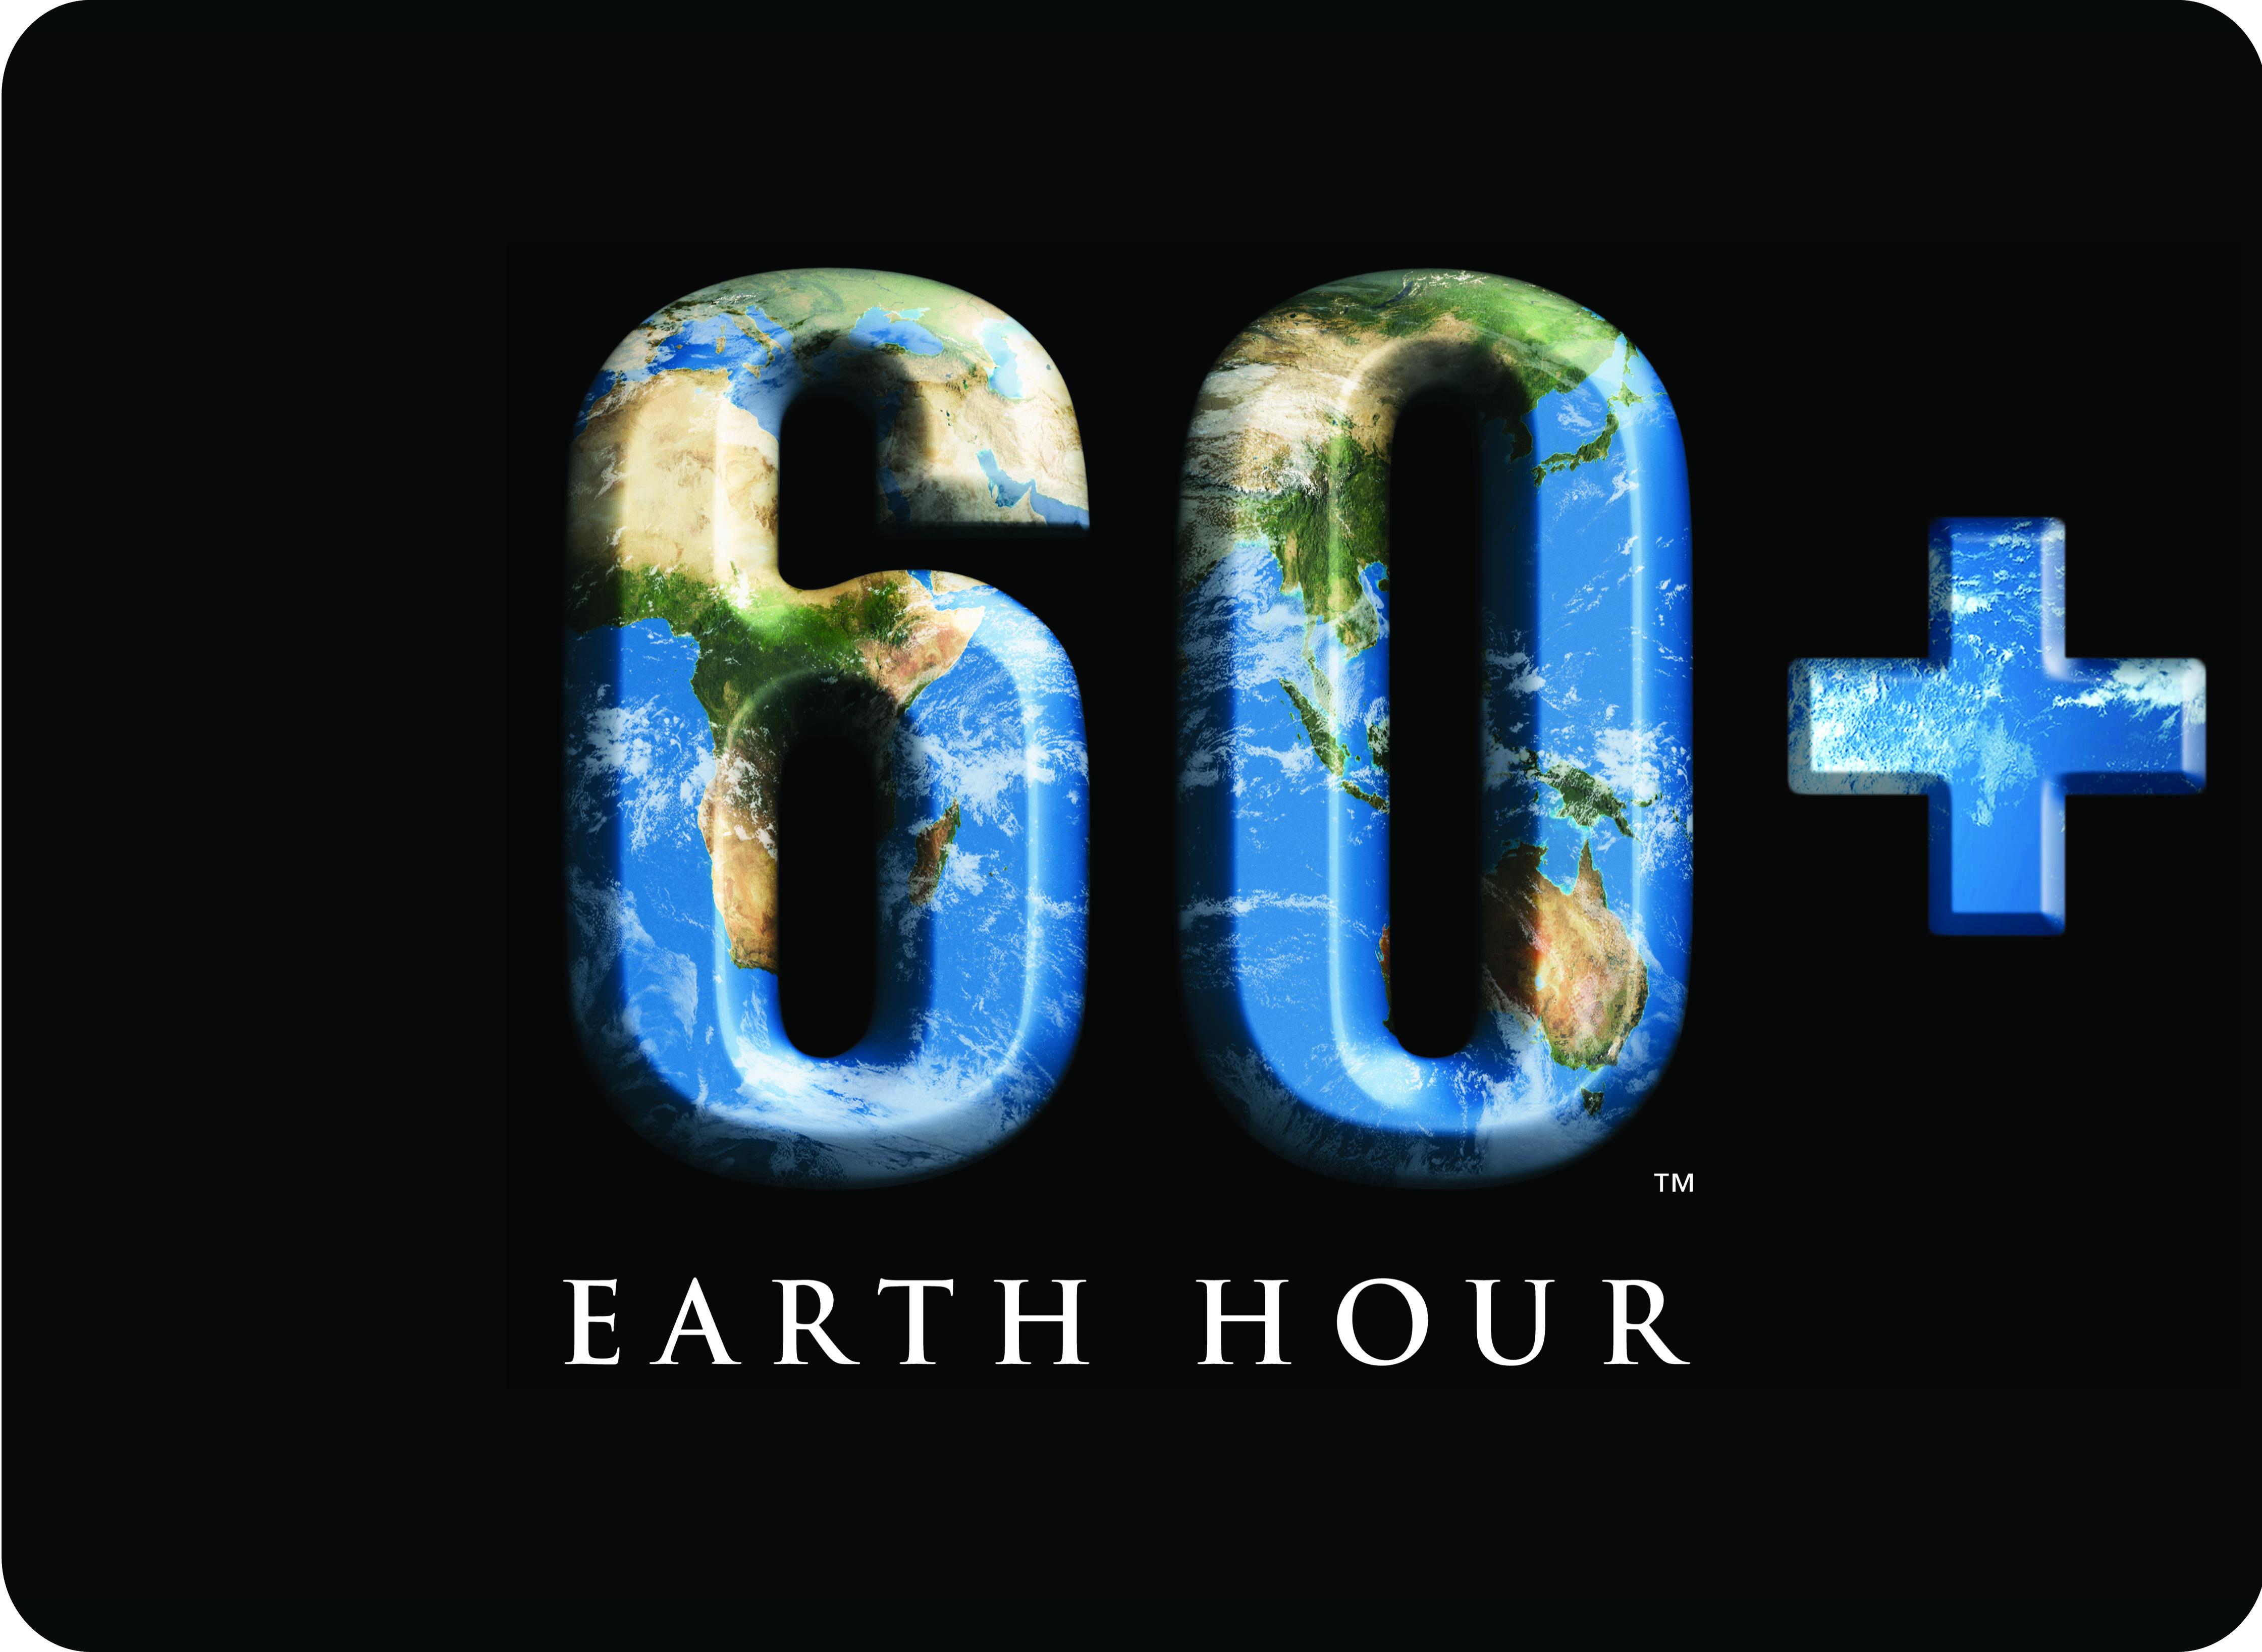 Earth hour logo.